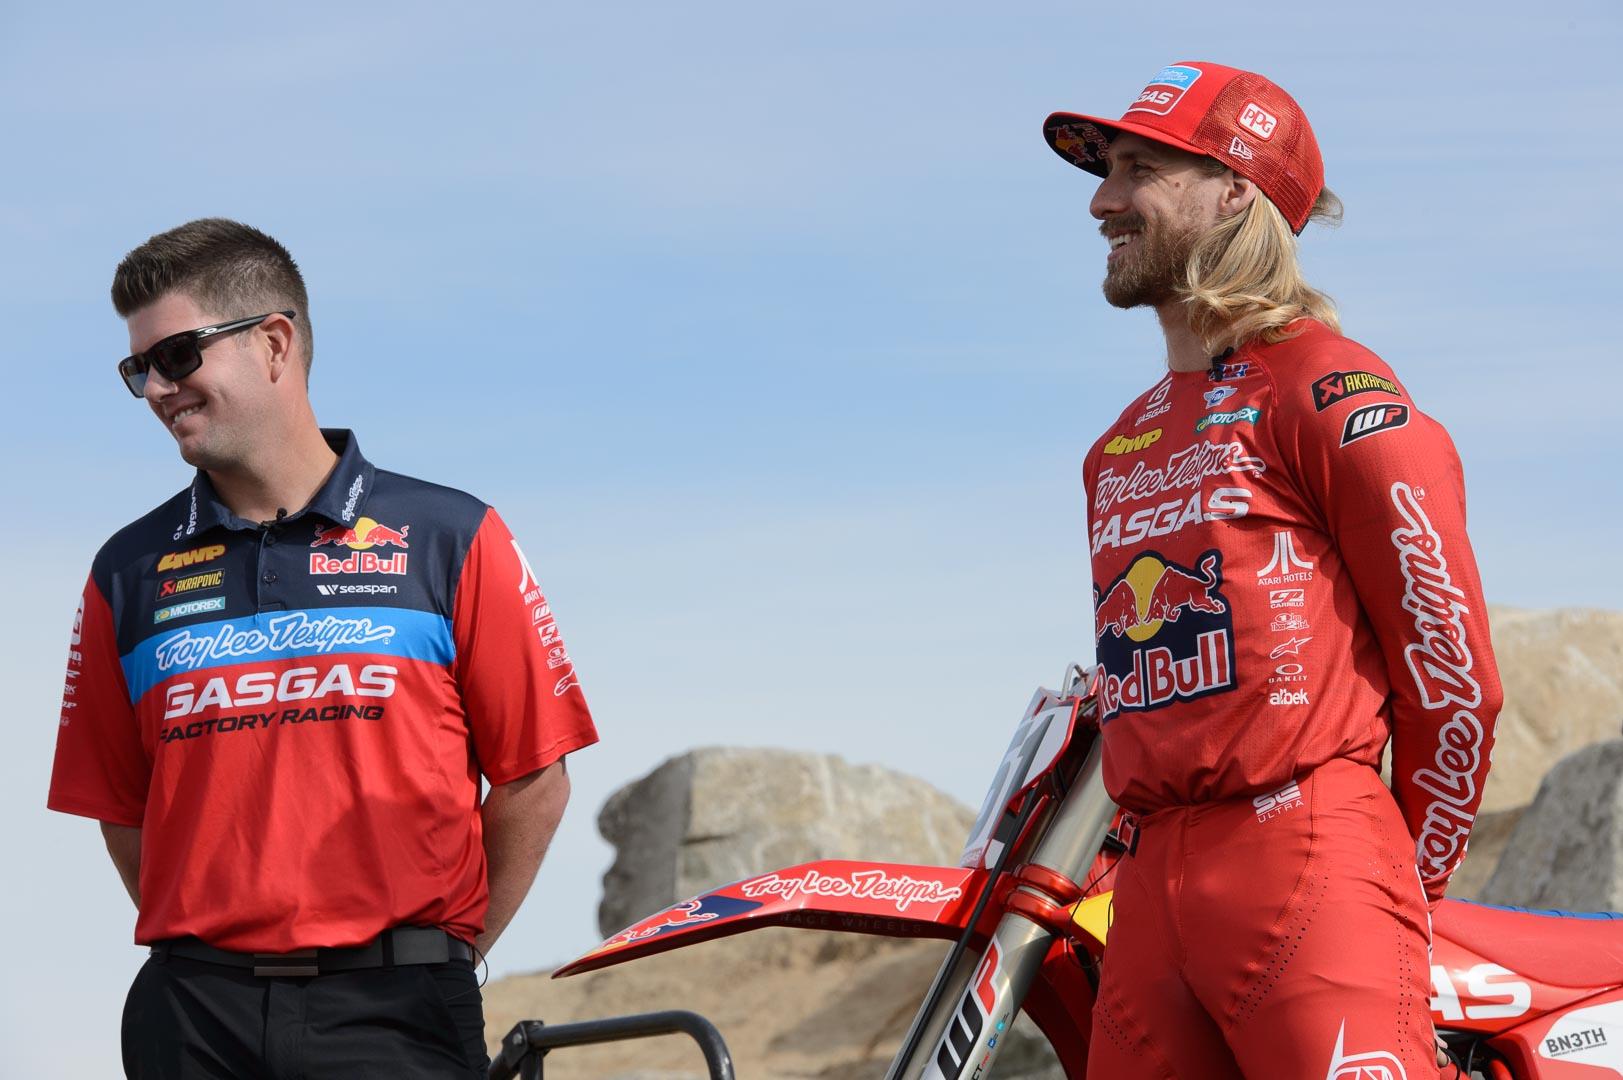 2021 GasGas Factory Racing Teams First Look: